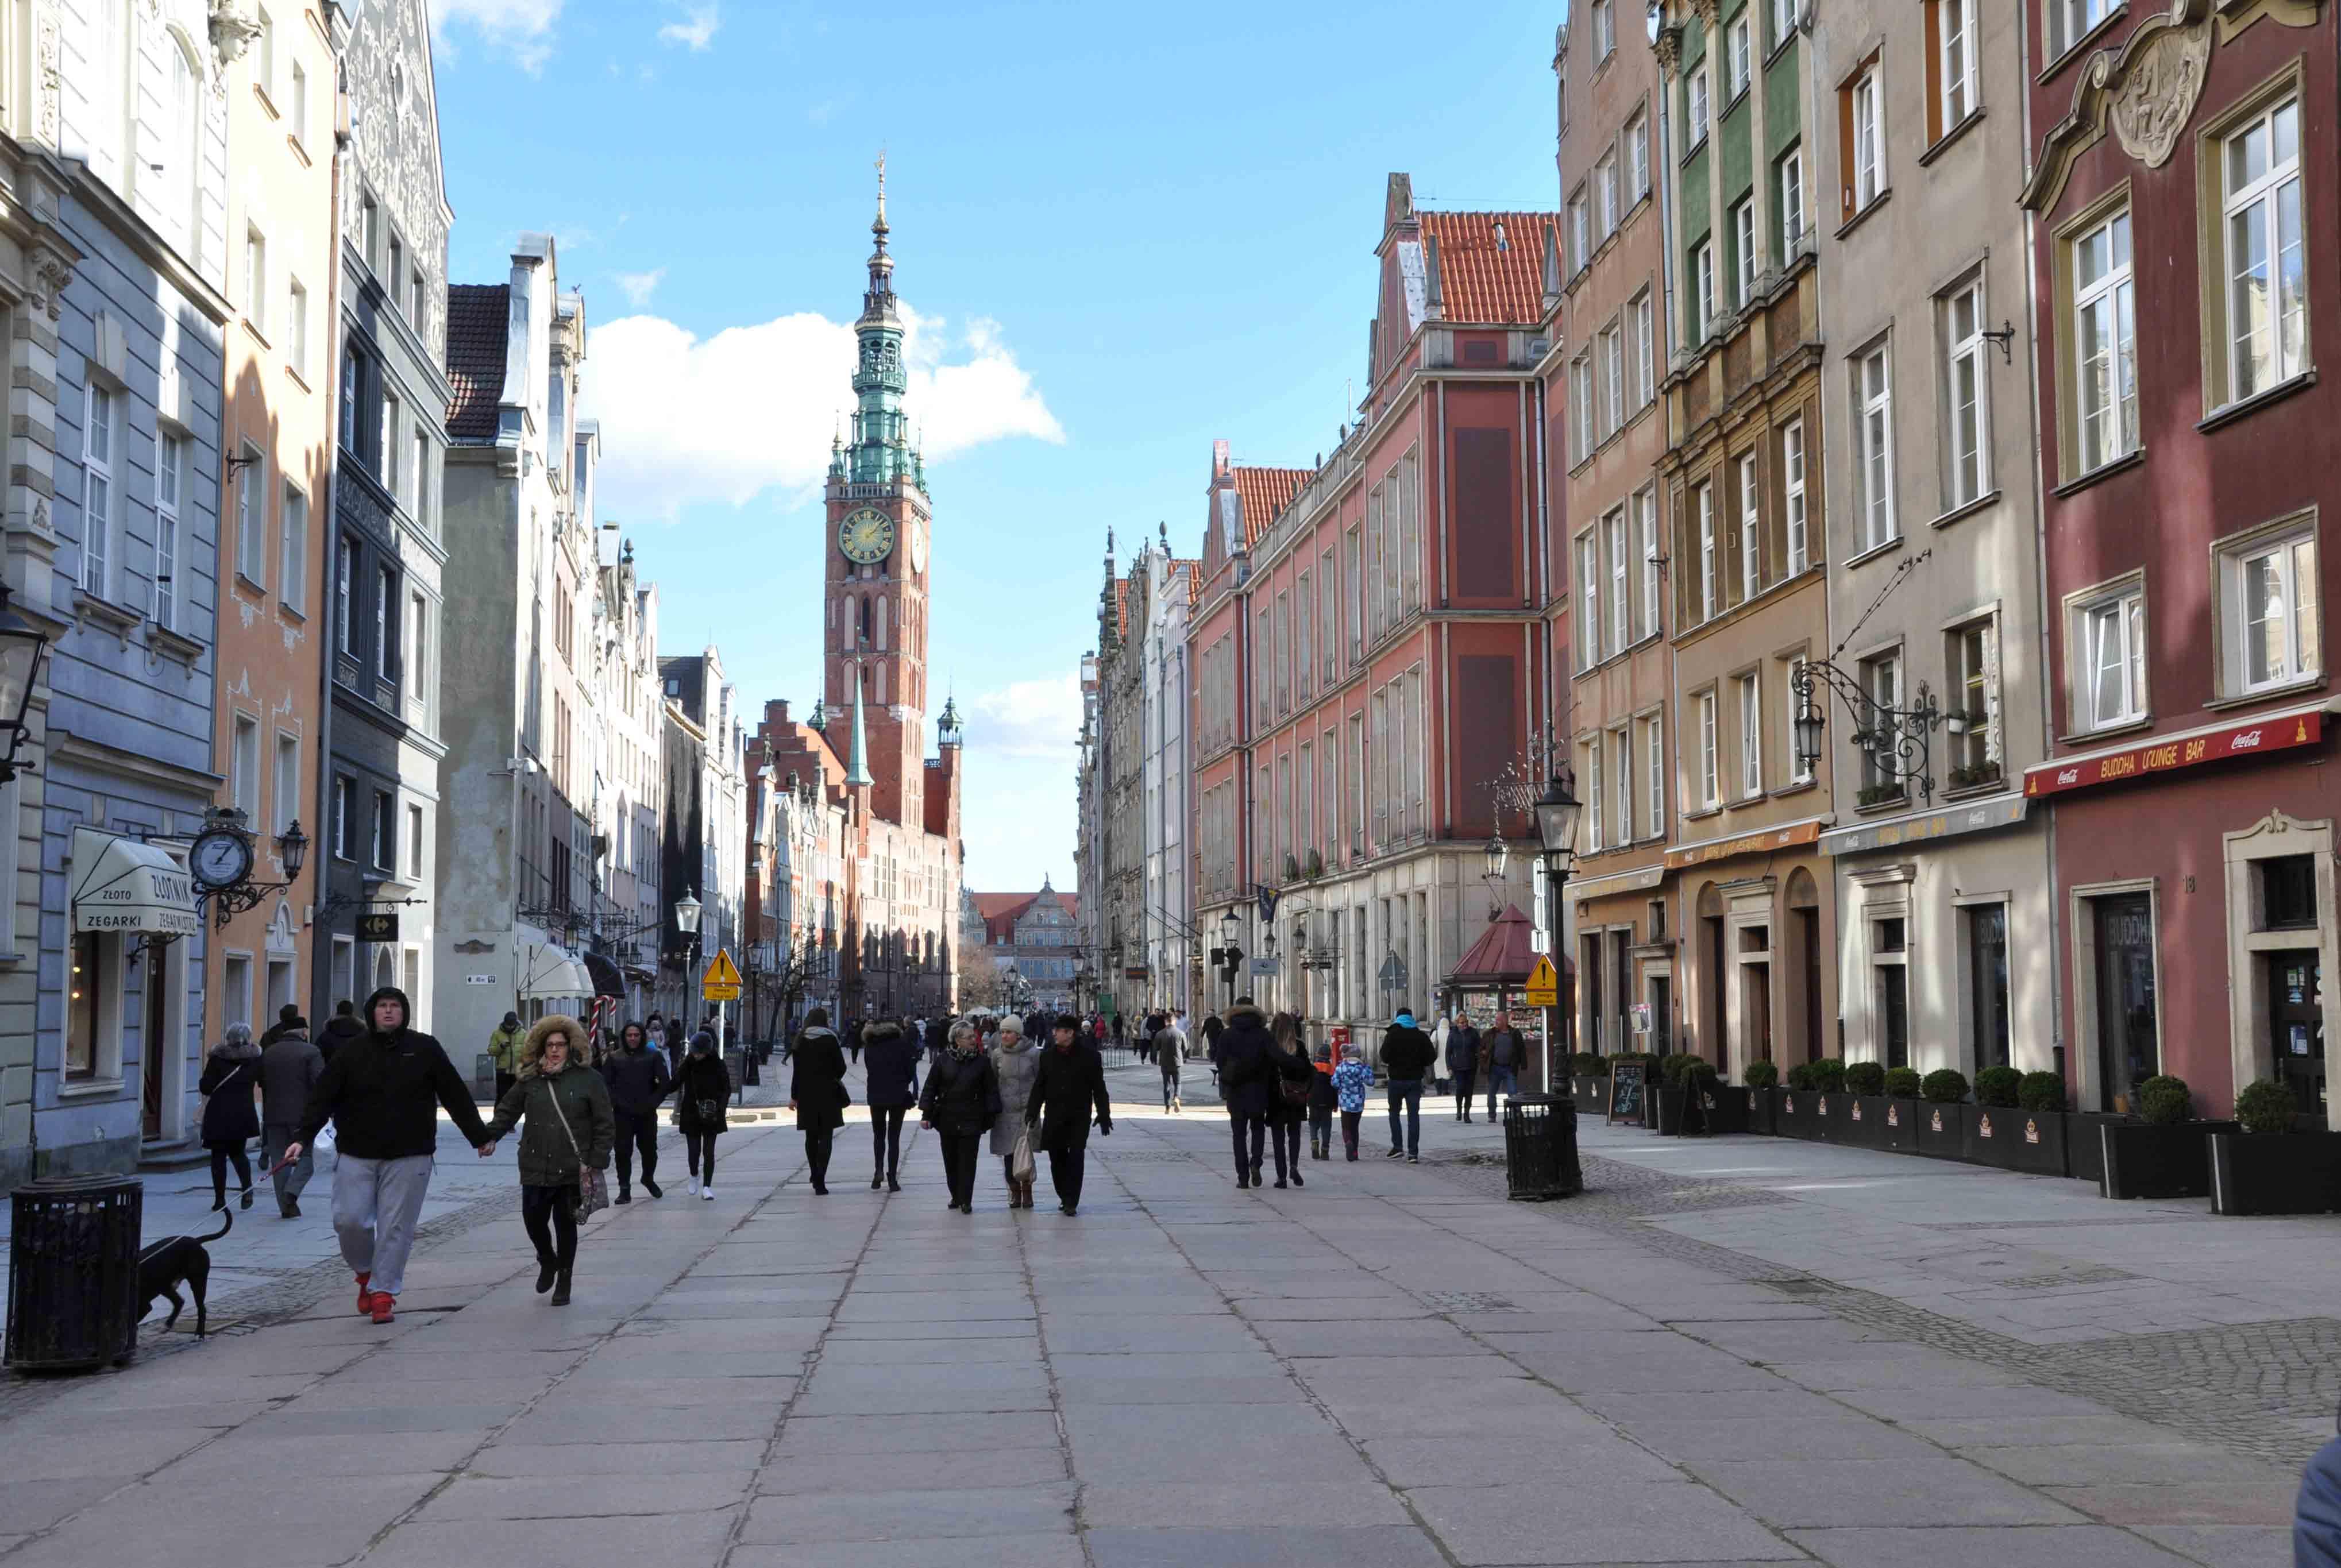 Dluga Street runs through the main city of Gdansk